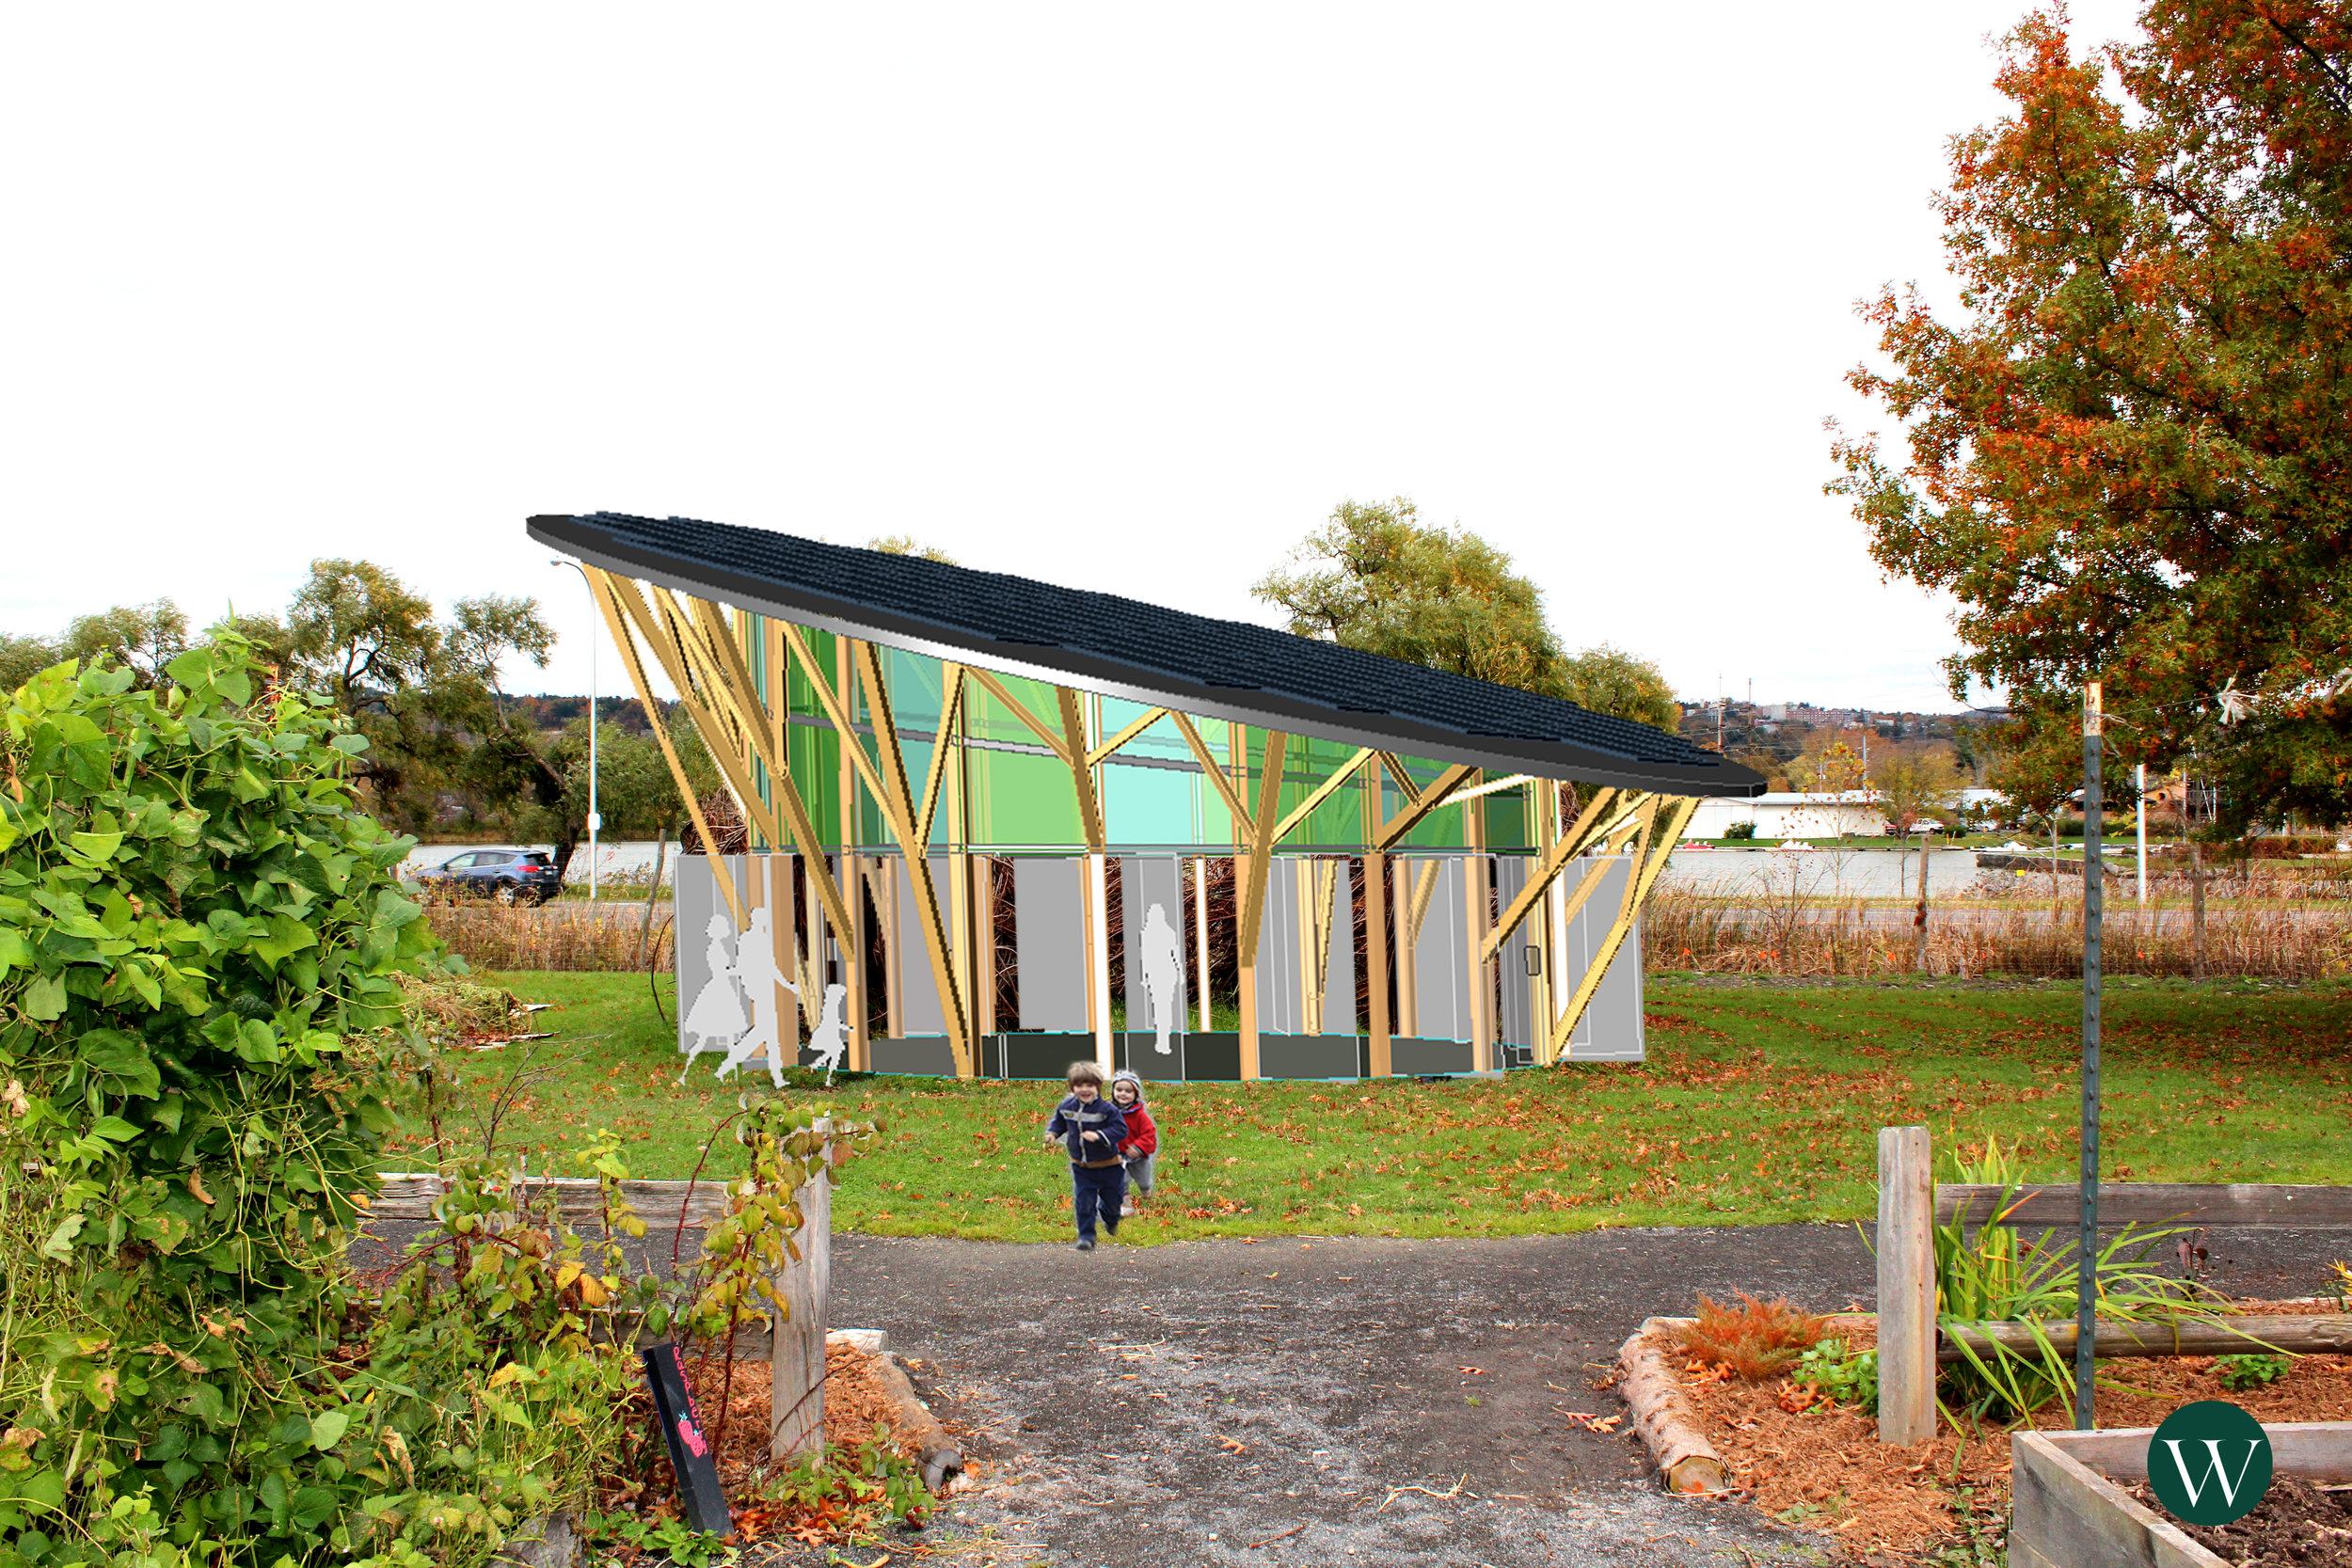 Ithaca-Childrens-Garden-PERSP.jpg